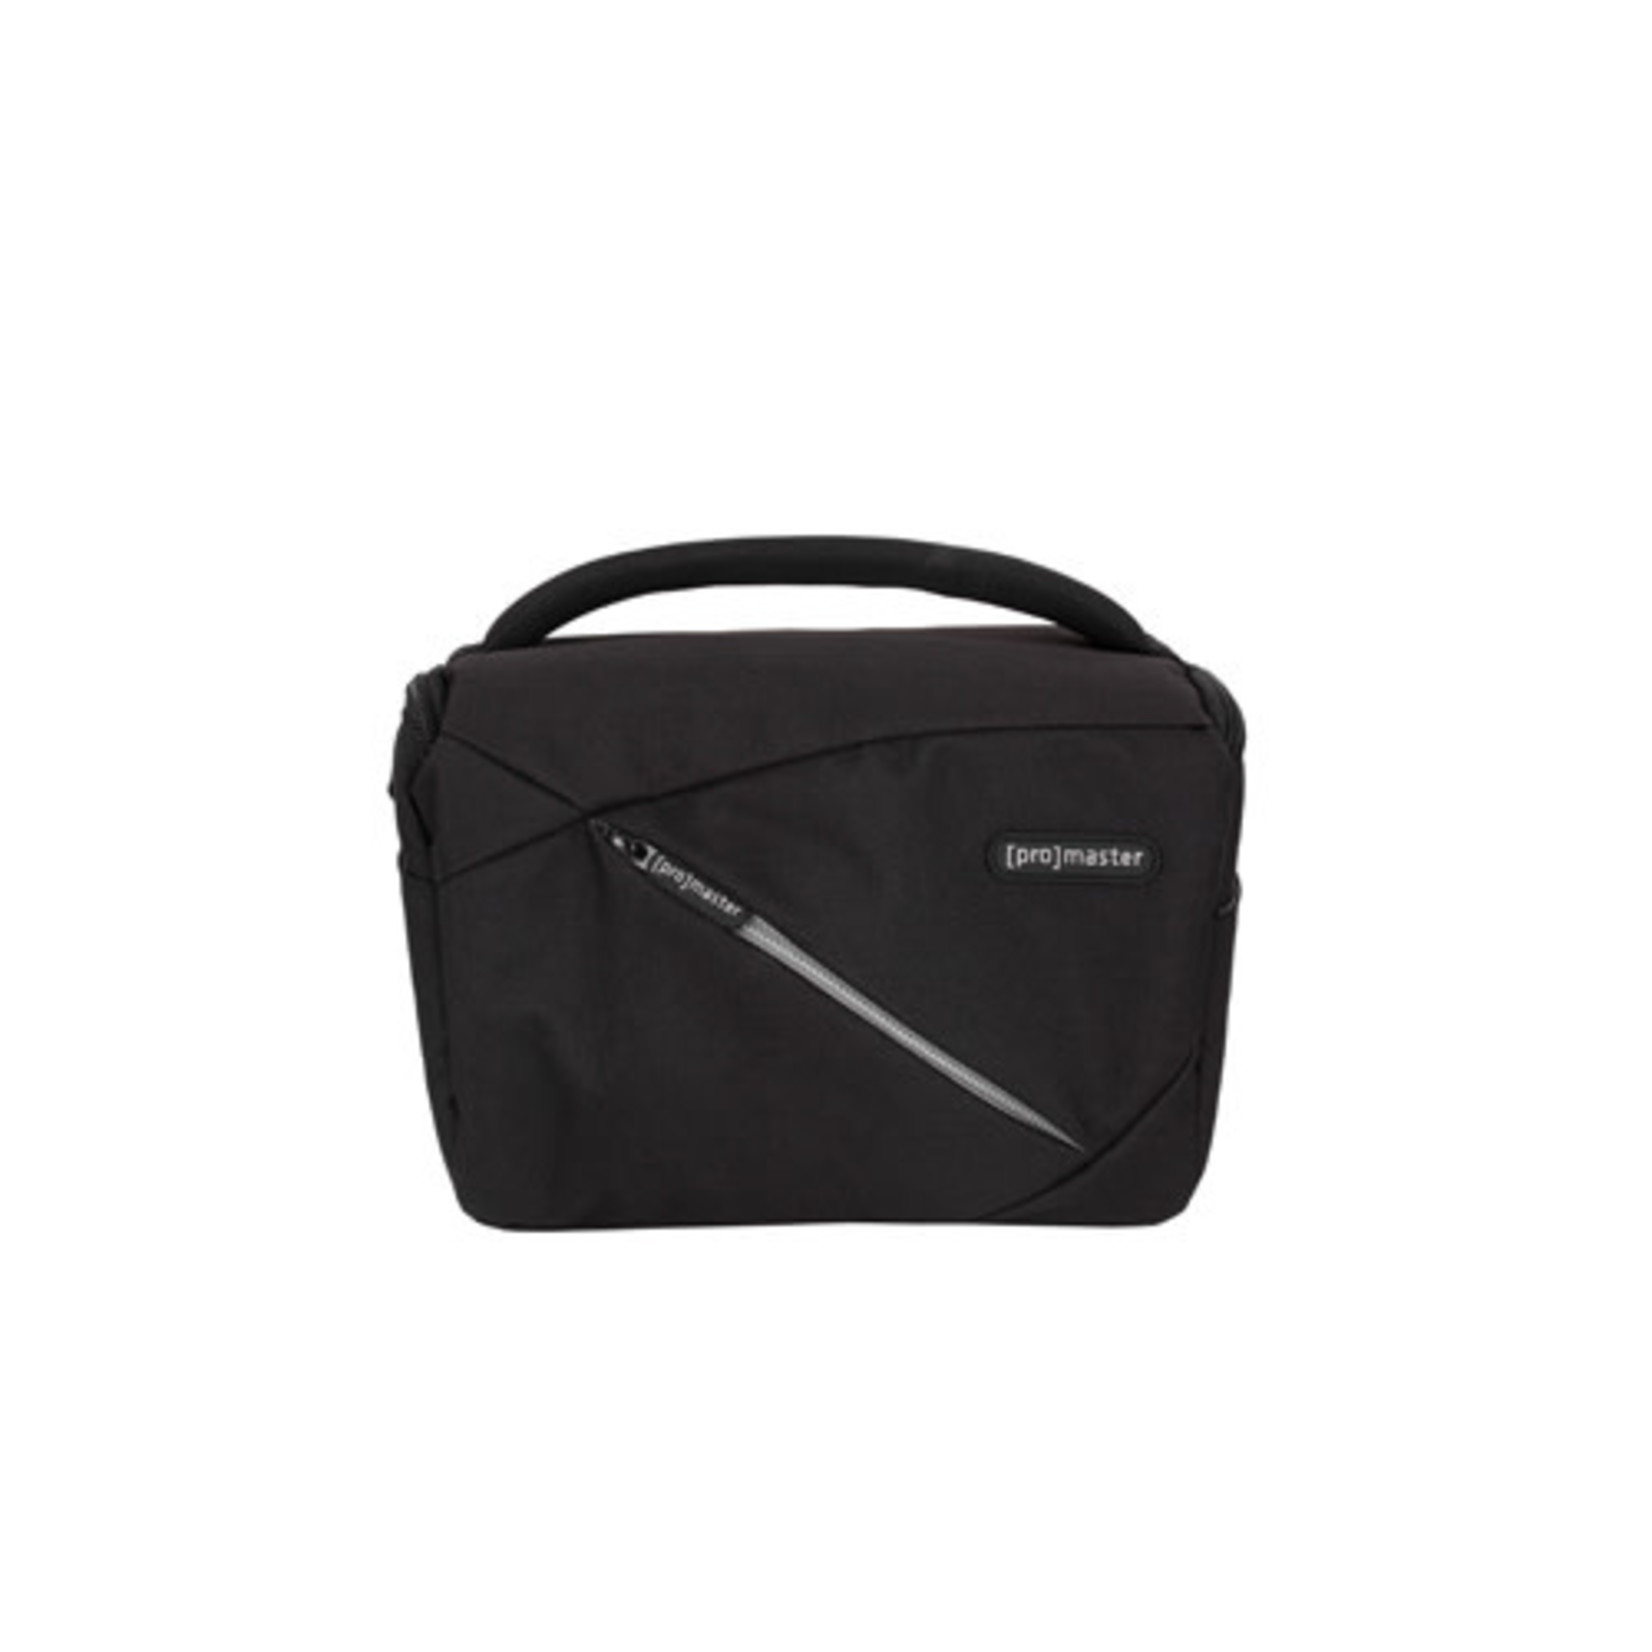 ProMaster Impulse Medium Shoulder Bag - Black